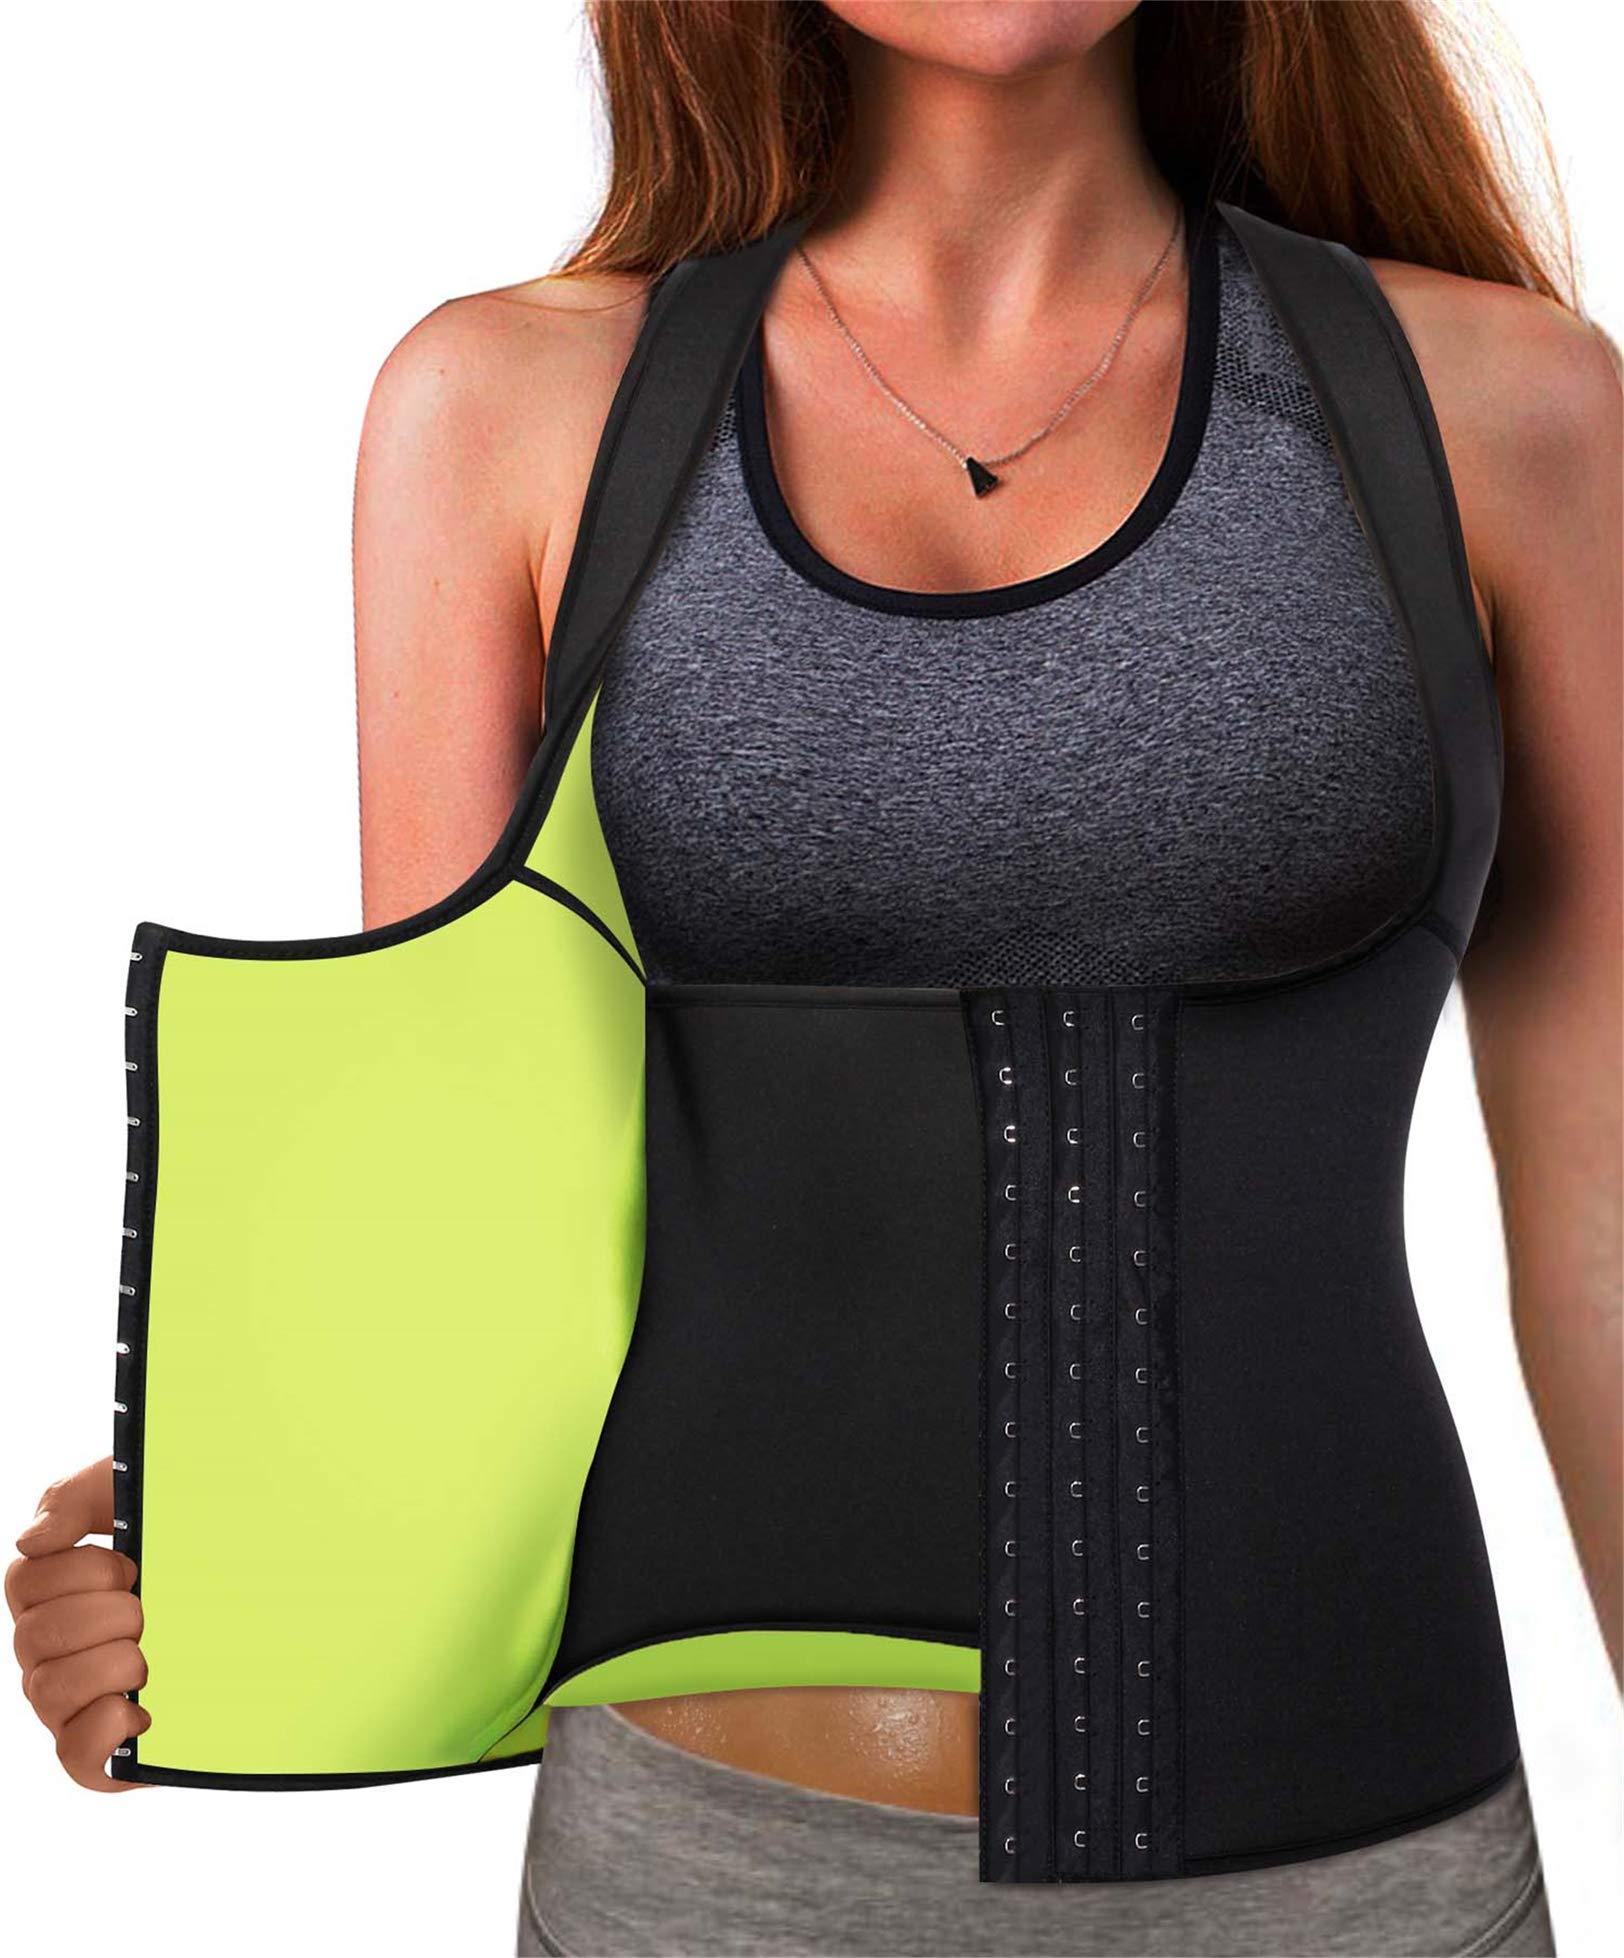 Eleady Best Neoprene Waist Trainer Corset Sweat Vest Weight Loss Body Shaper Workout Tank Tops Women (Black Sauna Suit, XXXL(US 18))